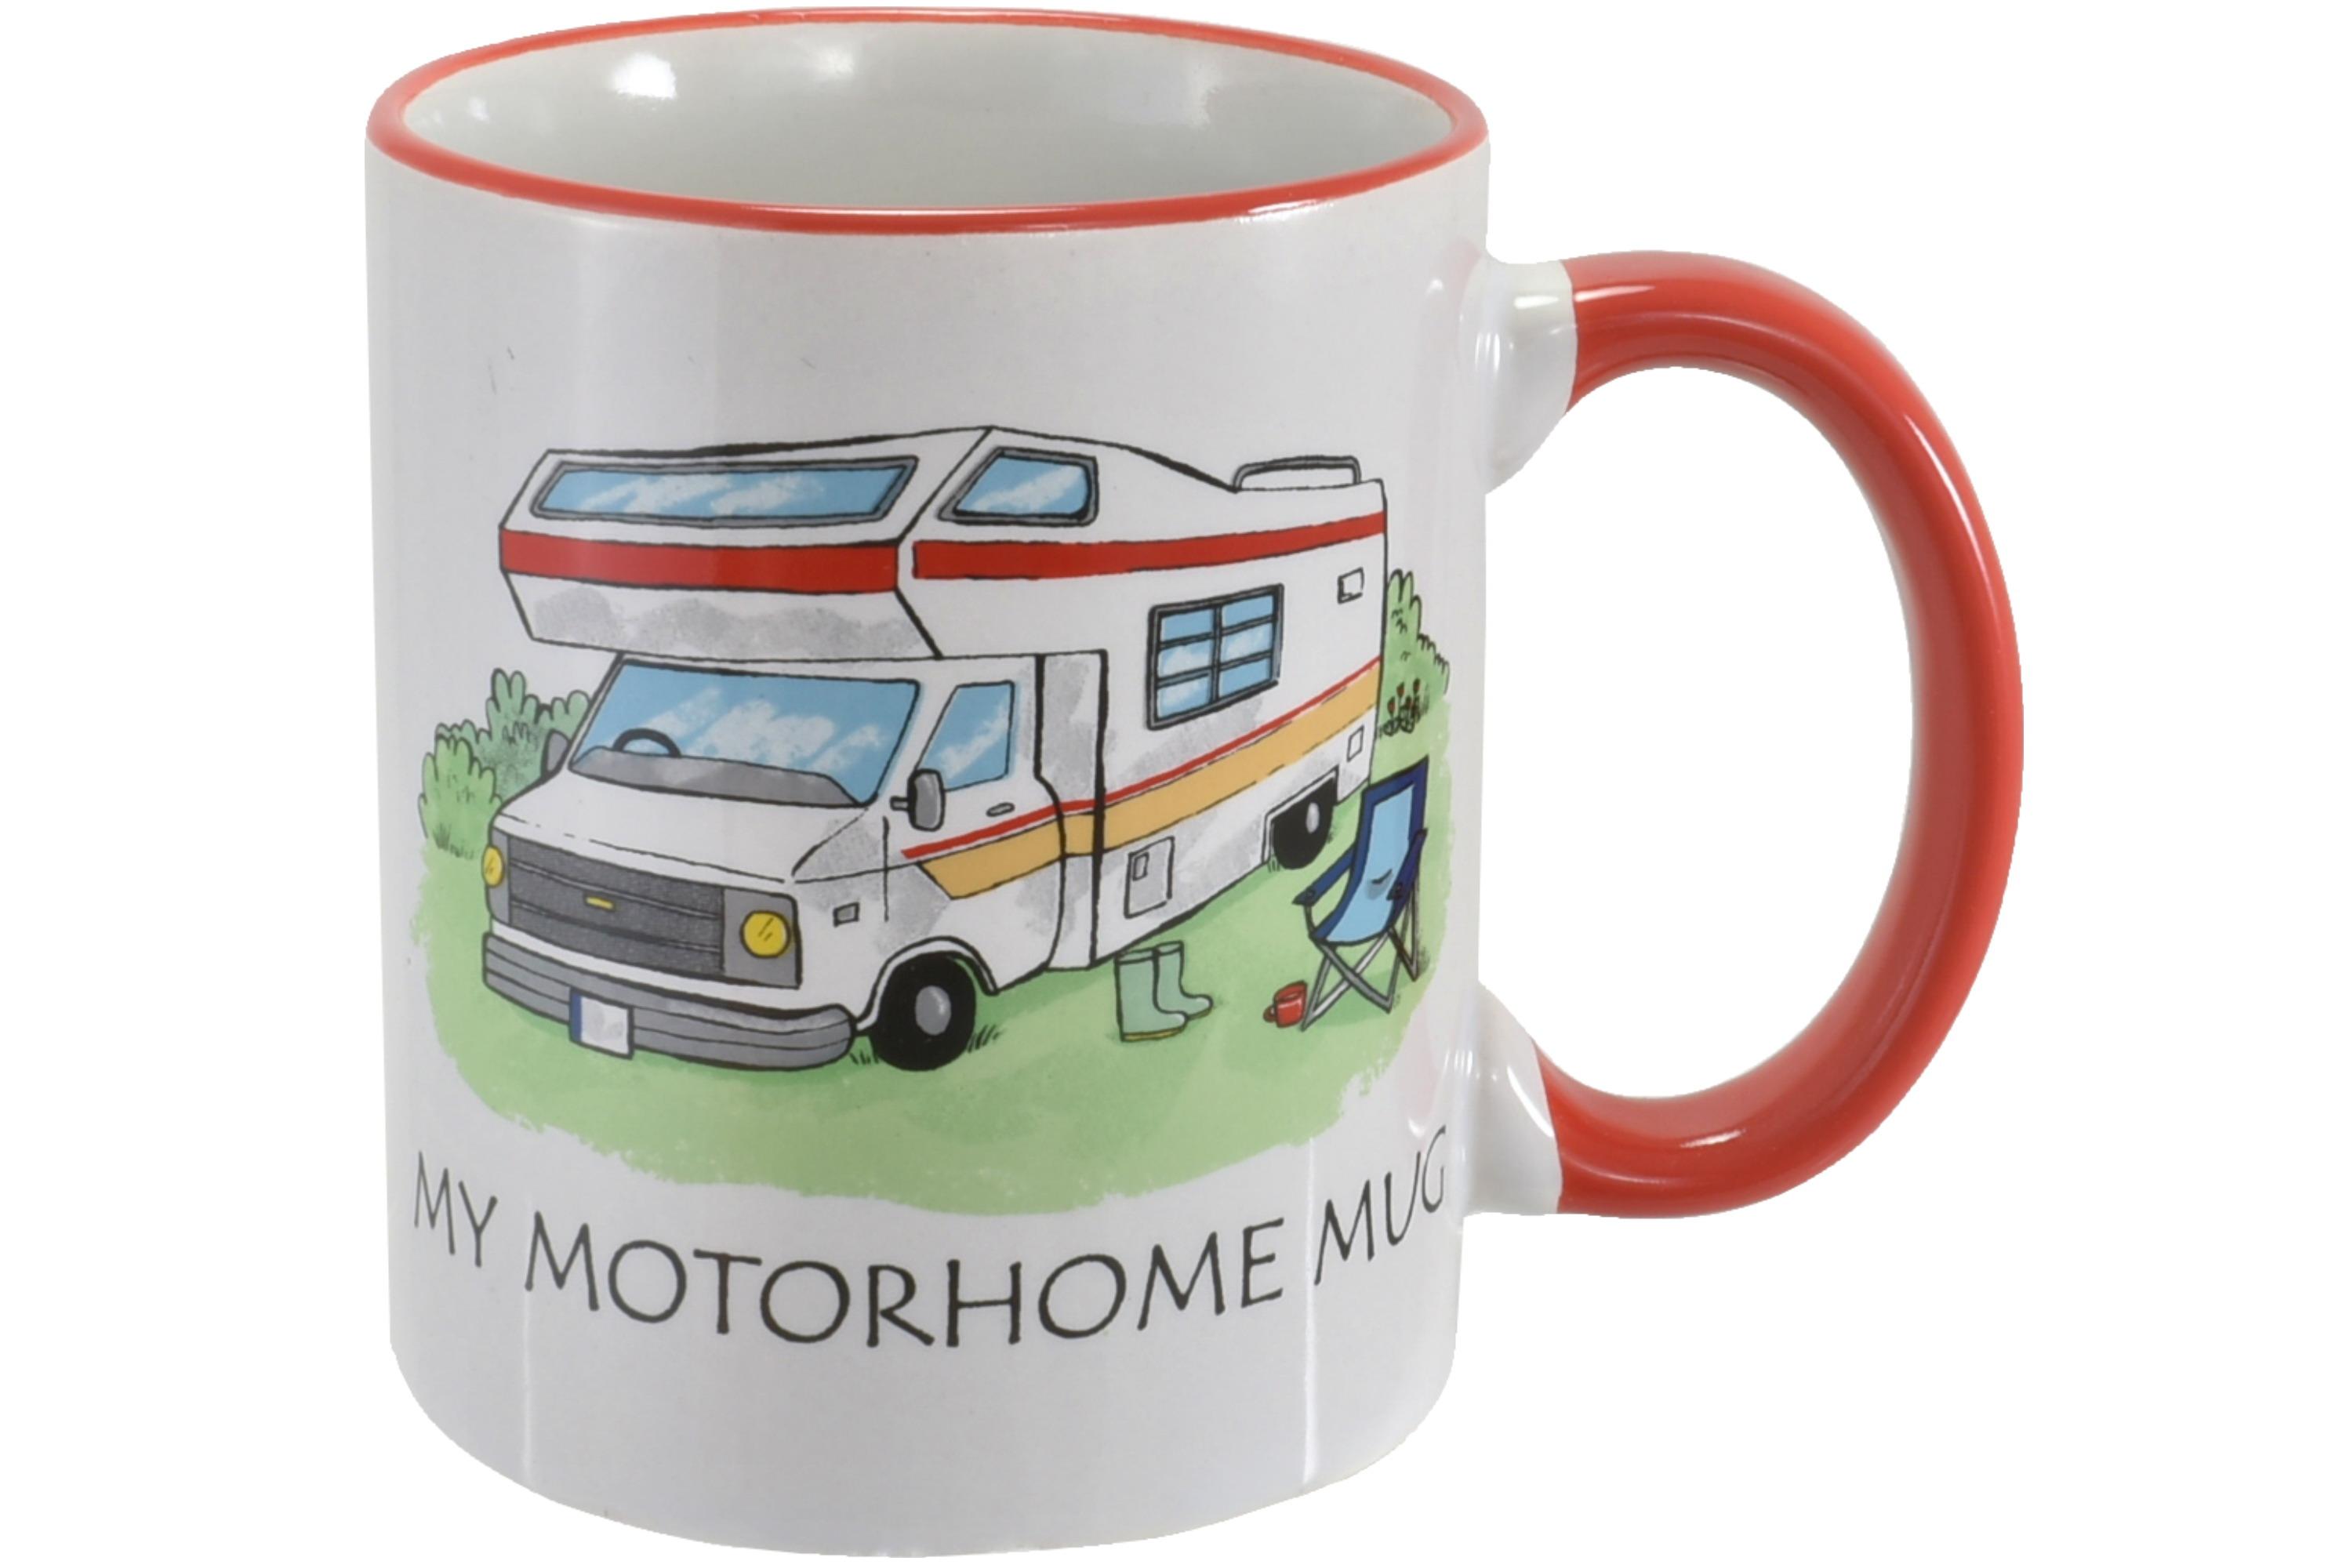 Motorhome Mug Stoneware 10oz